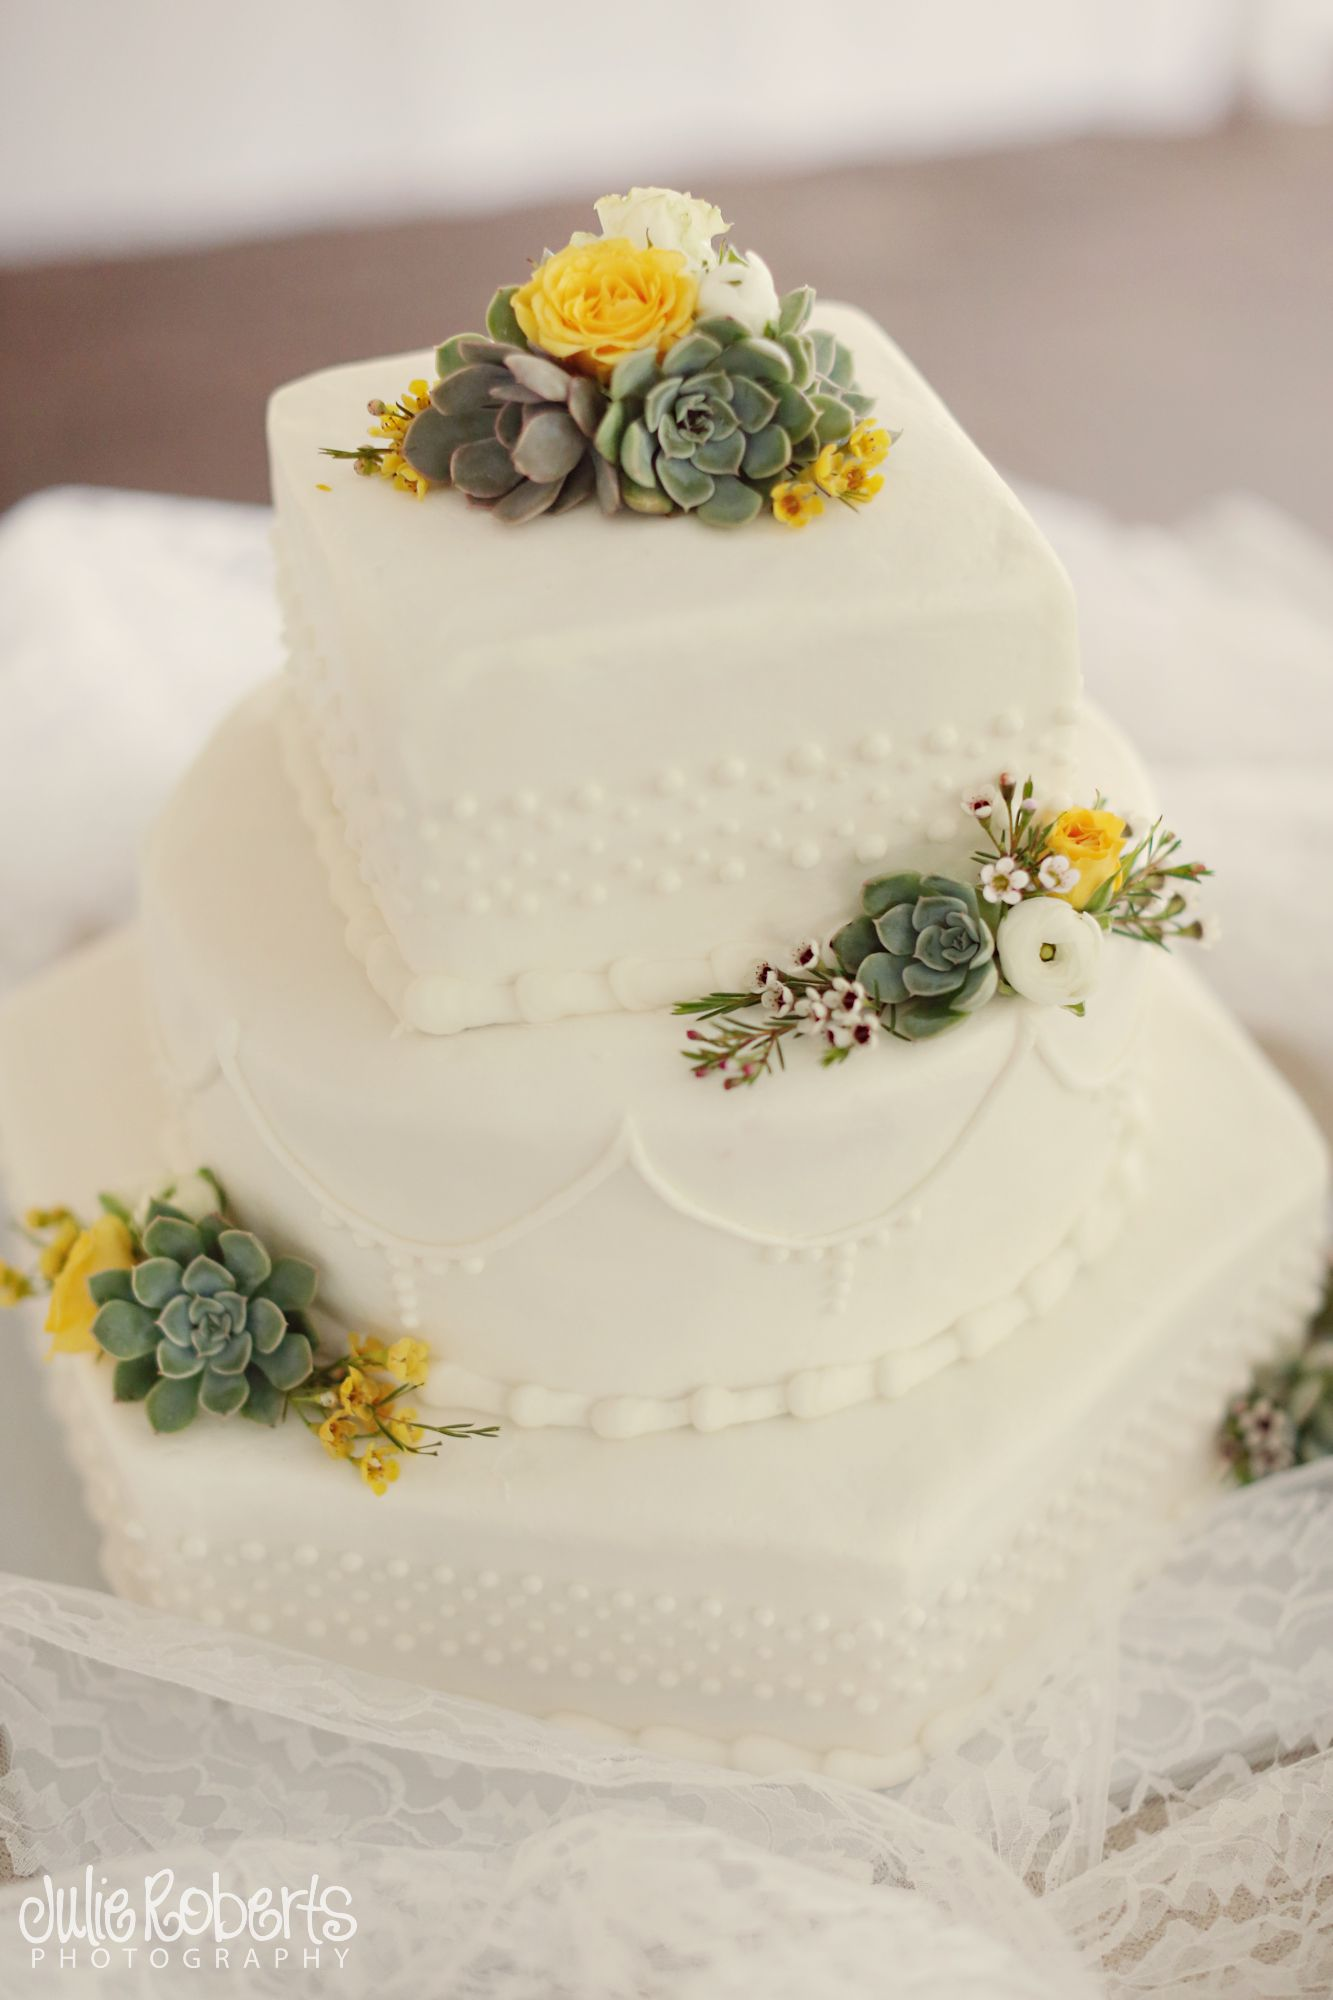 succulents on cake | Sassafras Flowers | Pinterest | Wedding and ...